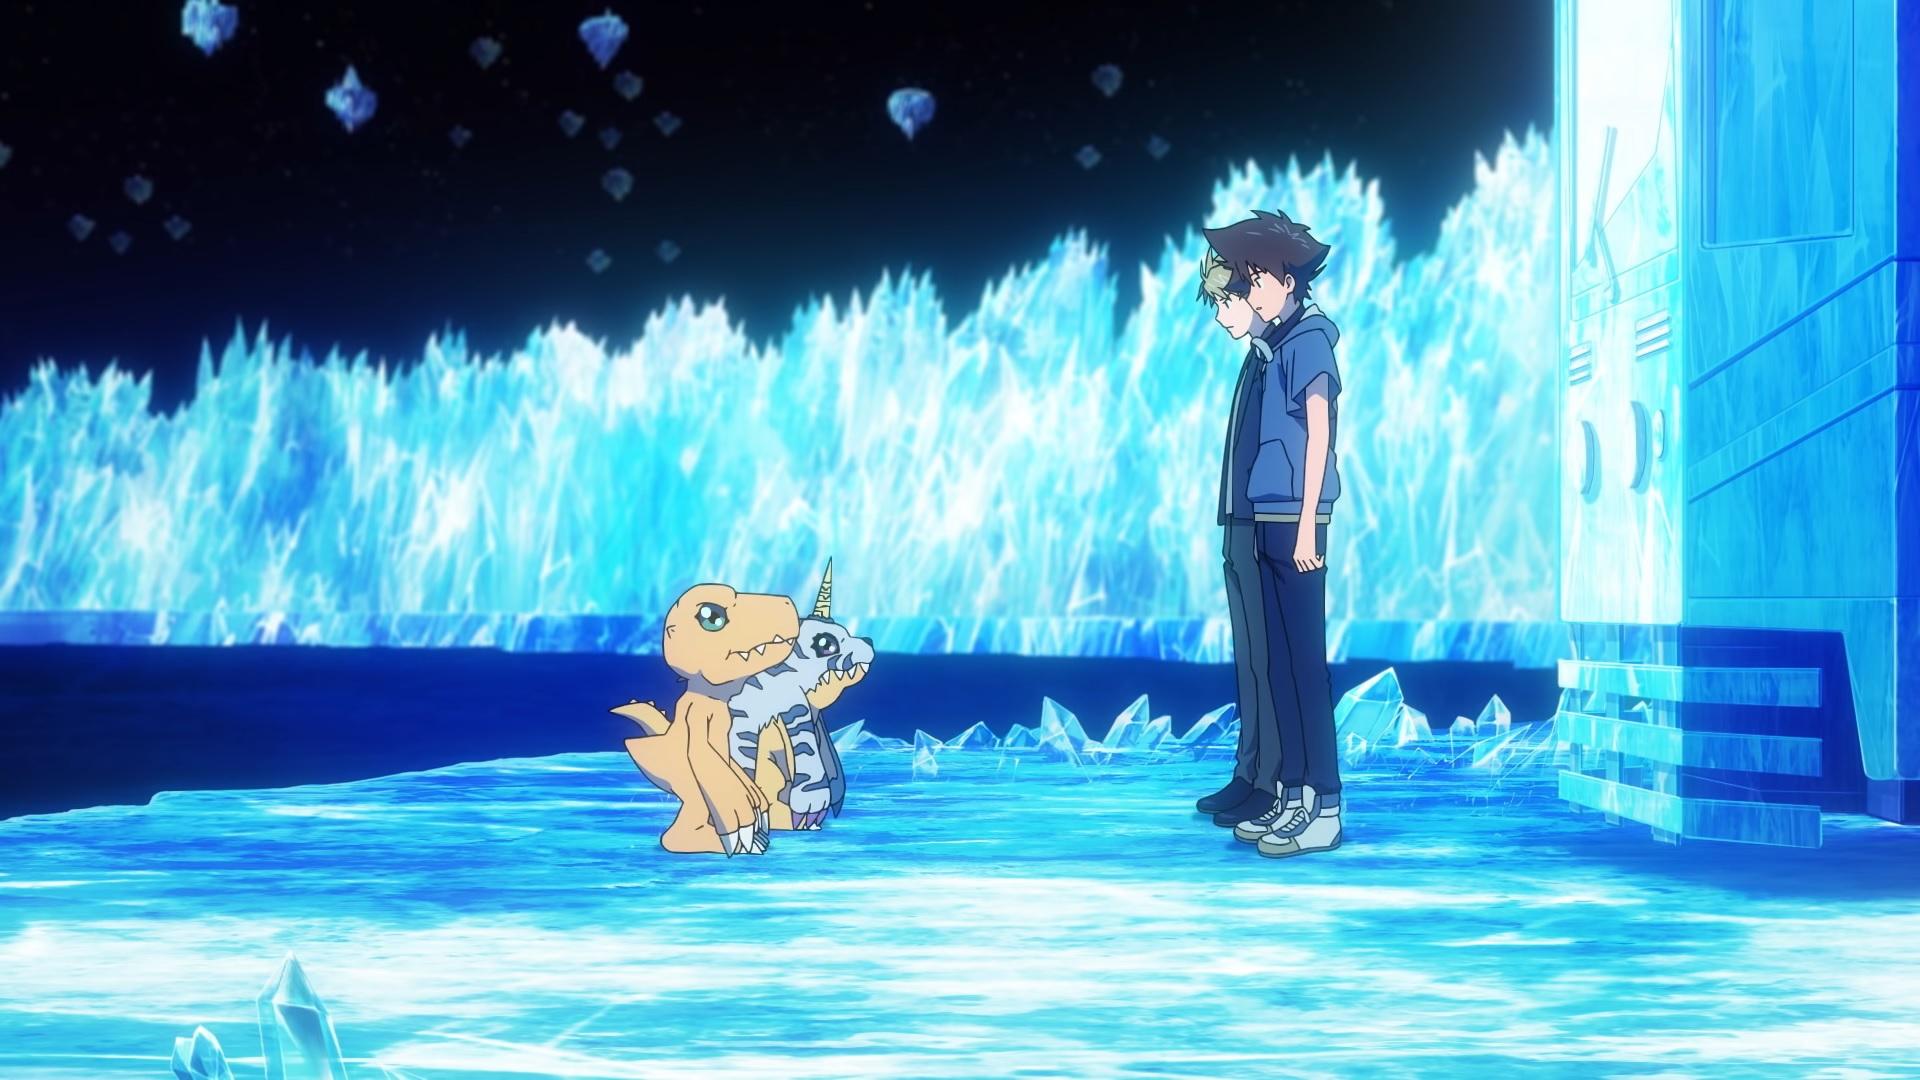 US Digimon Adventure Last Evolution Kizuna Release Date Is March 2020